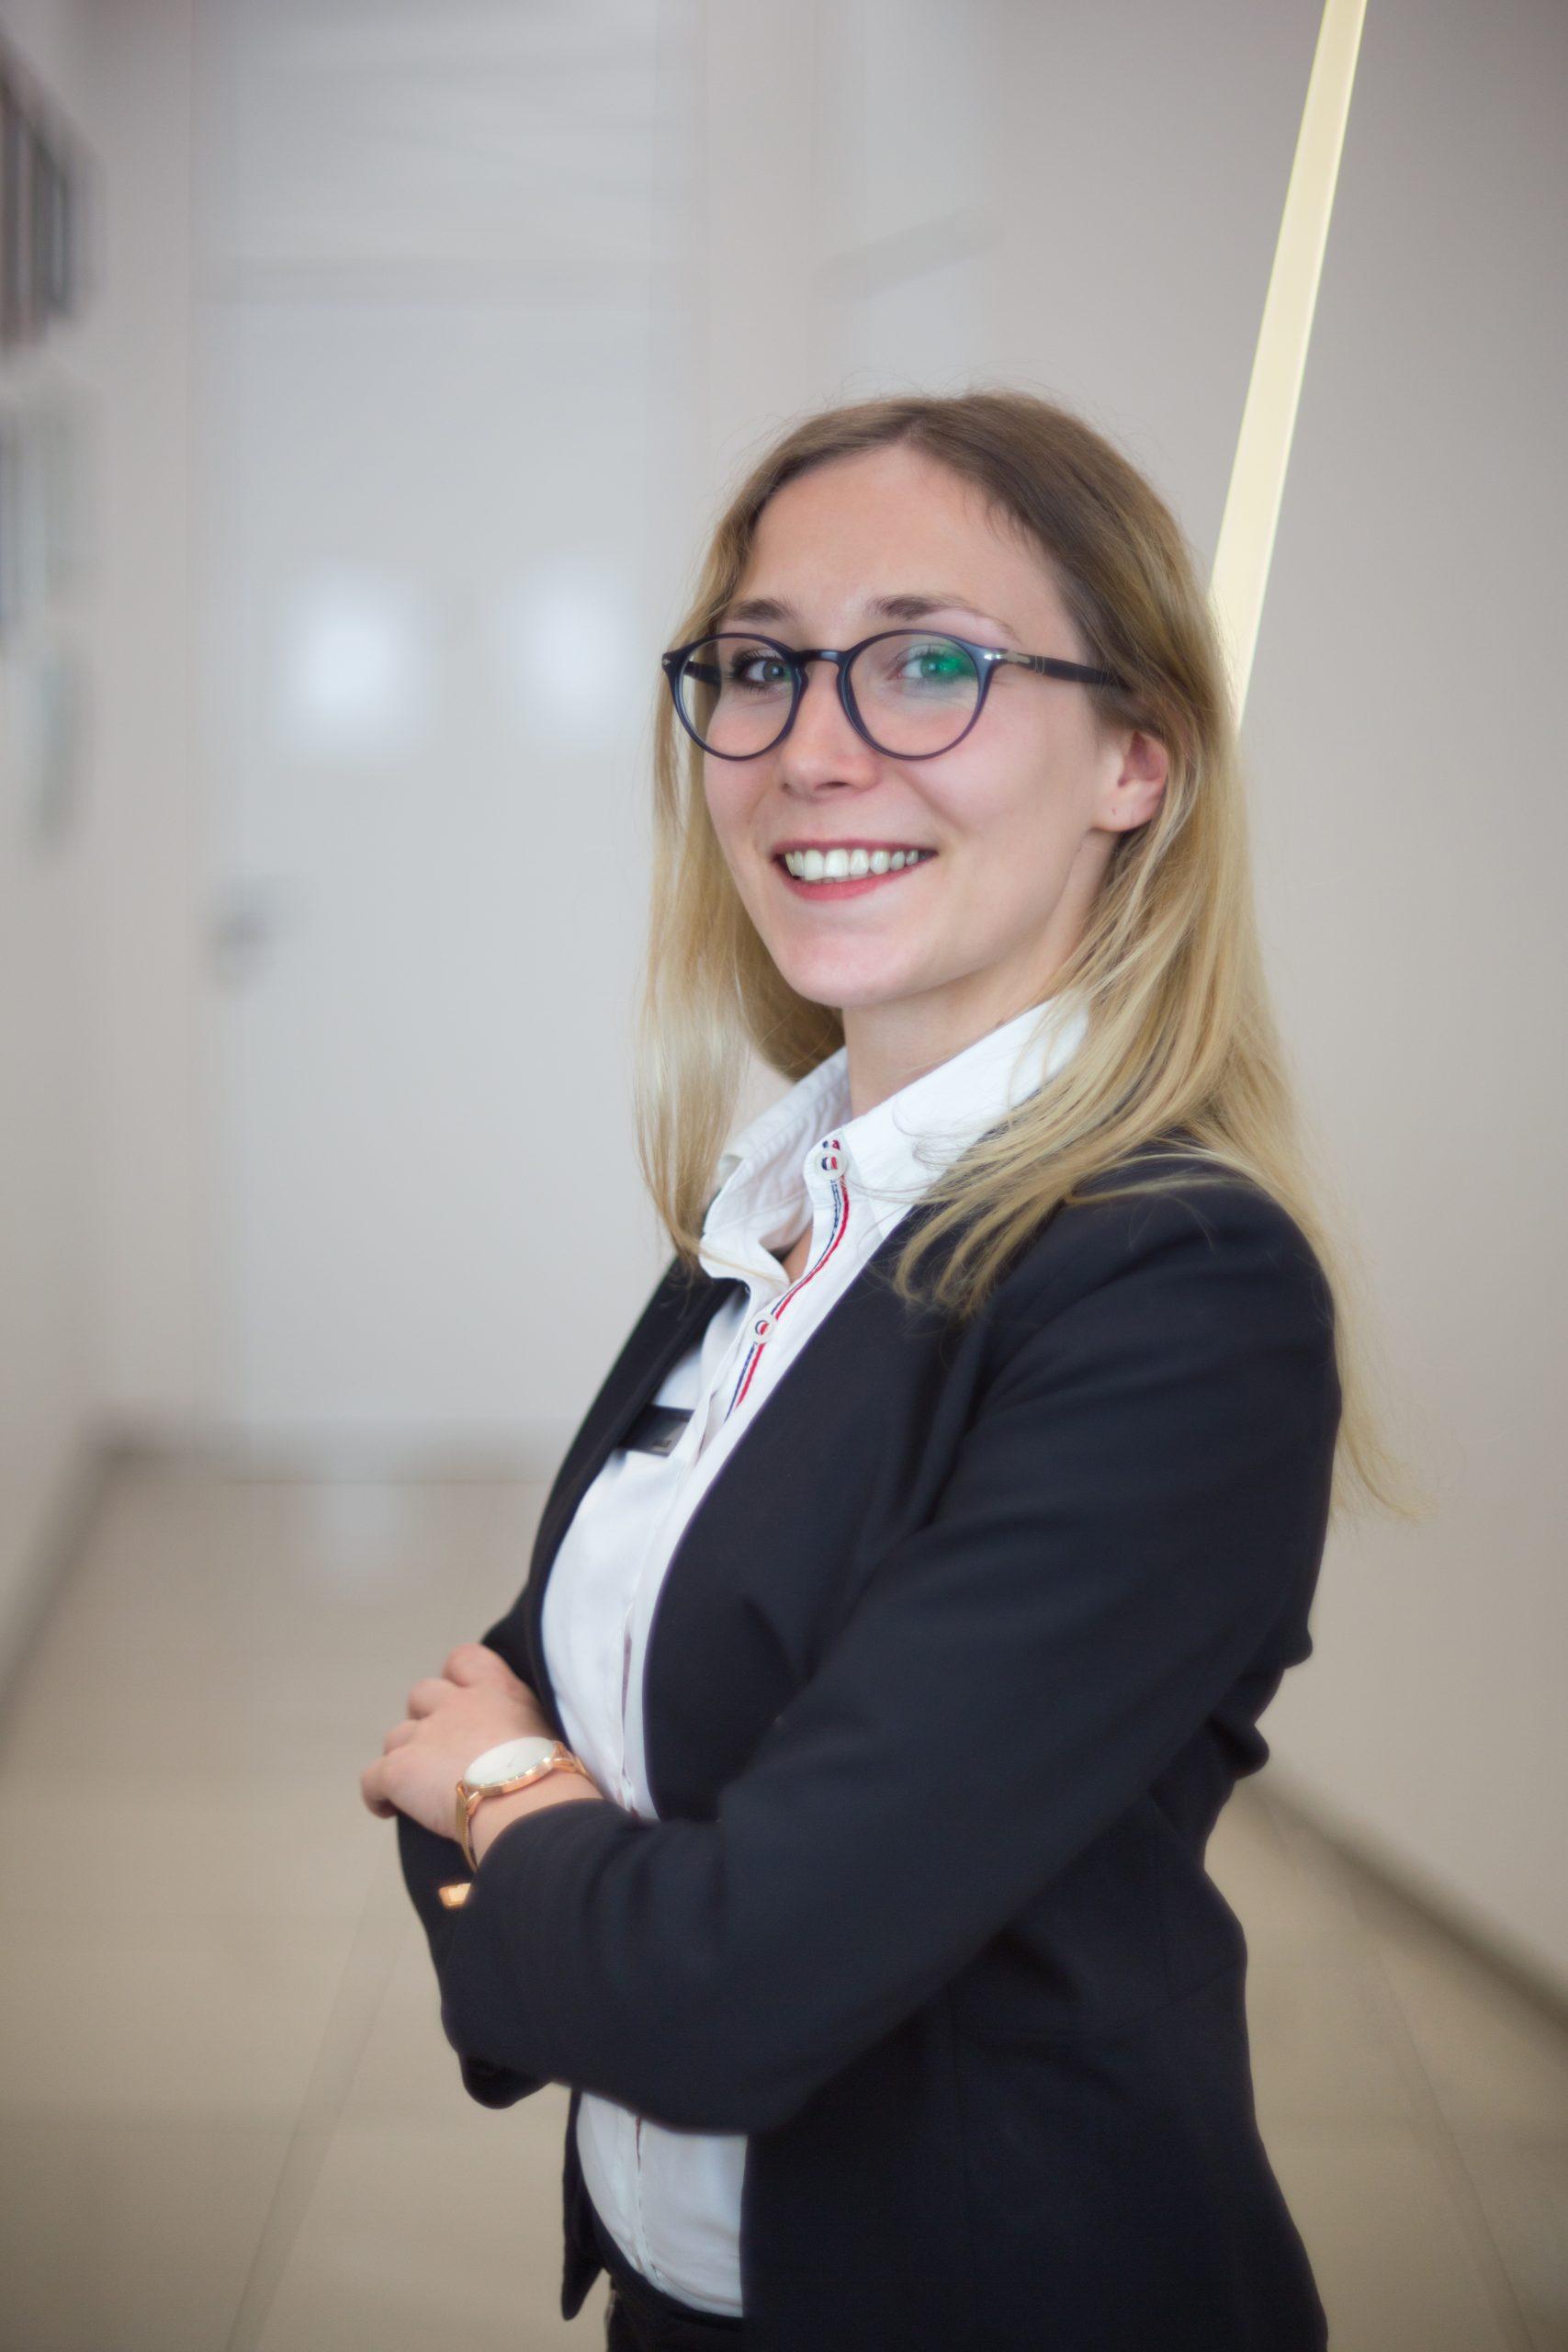 Maria Dmowska